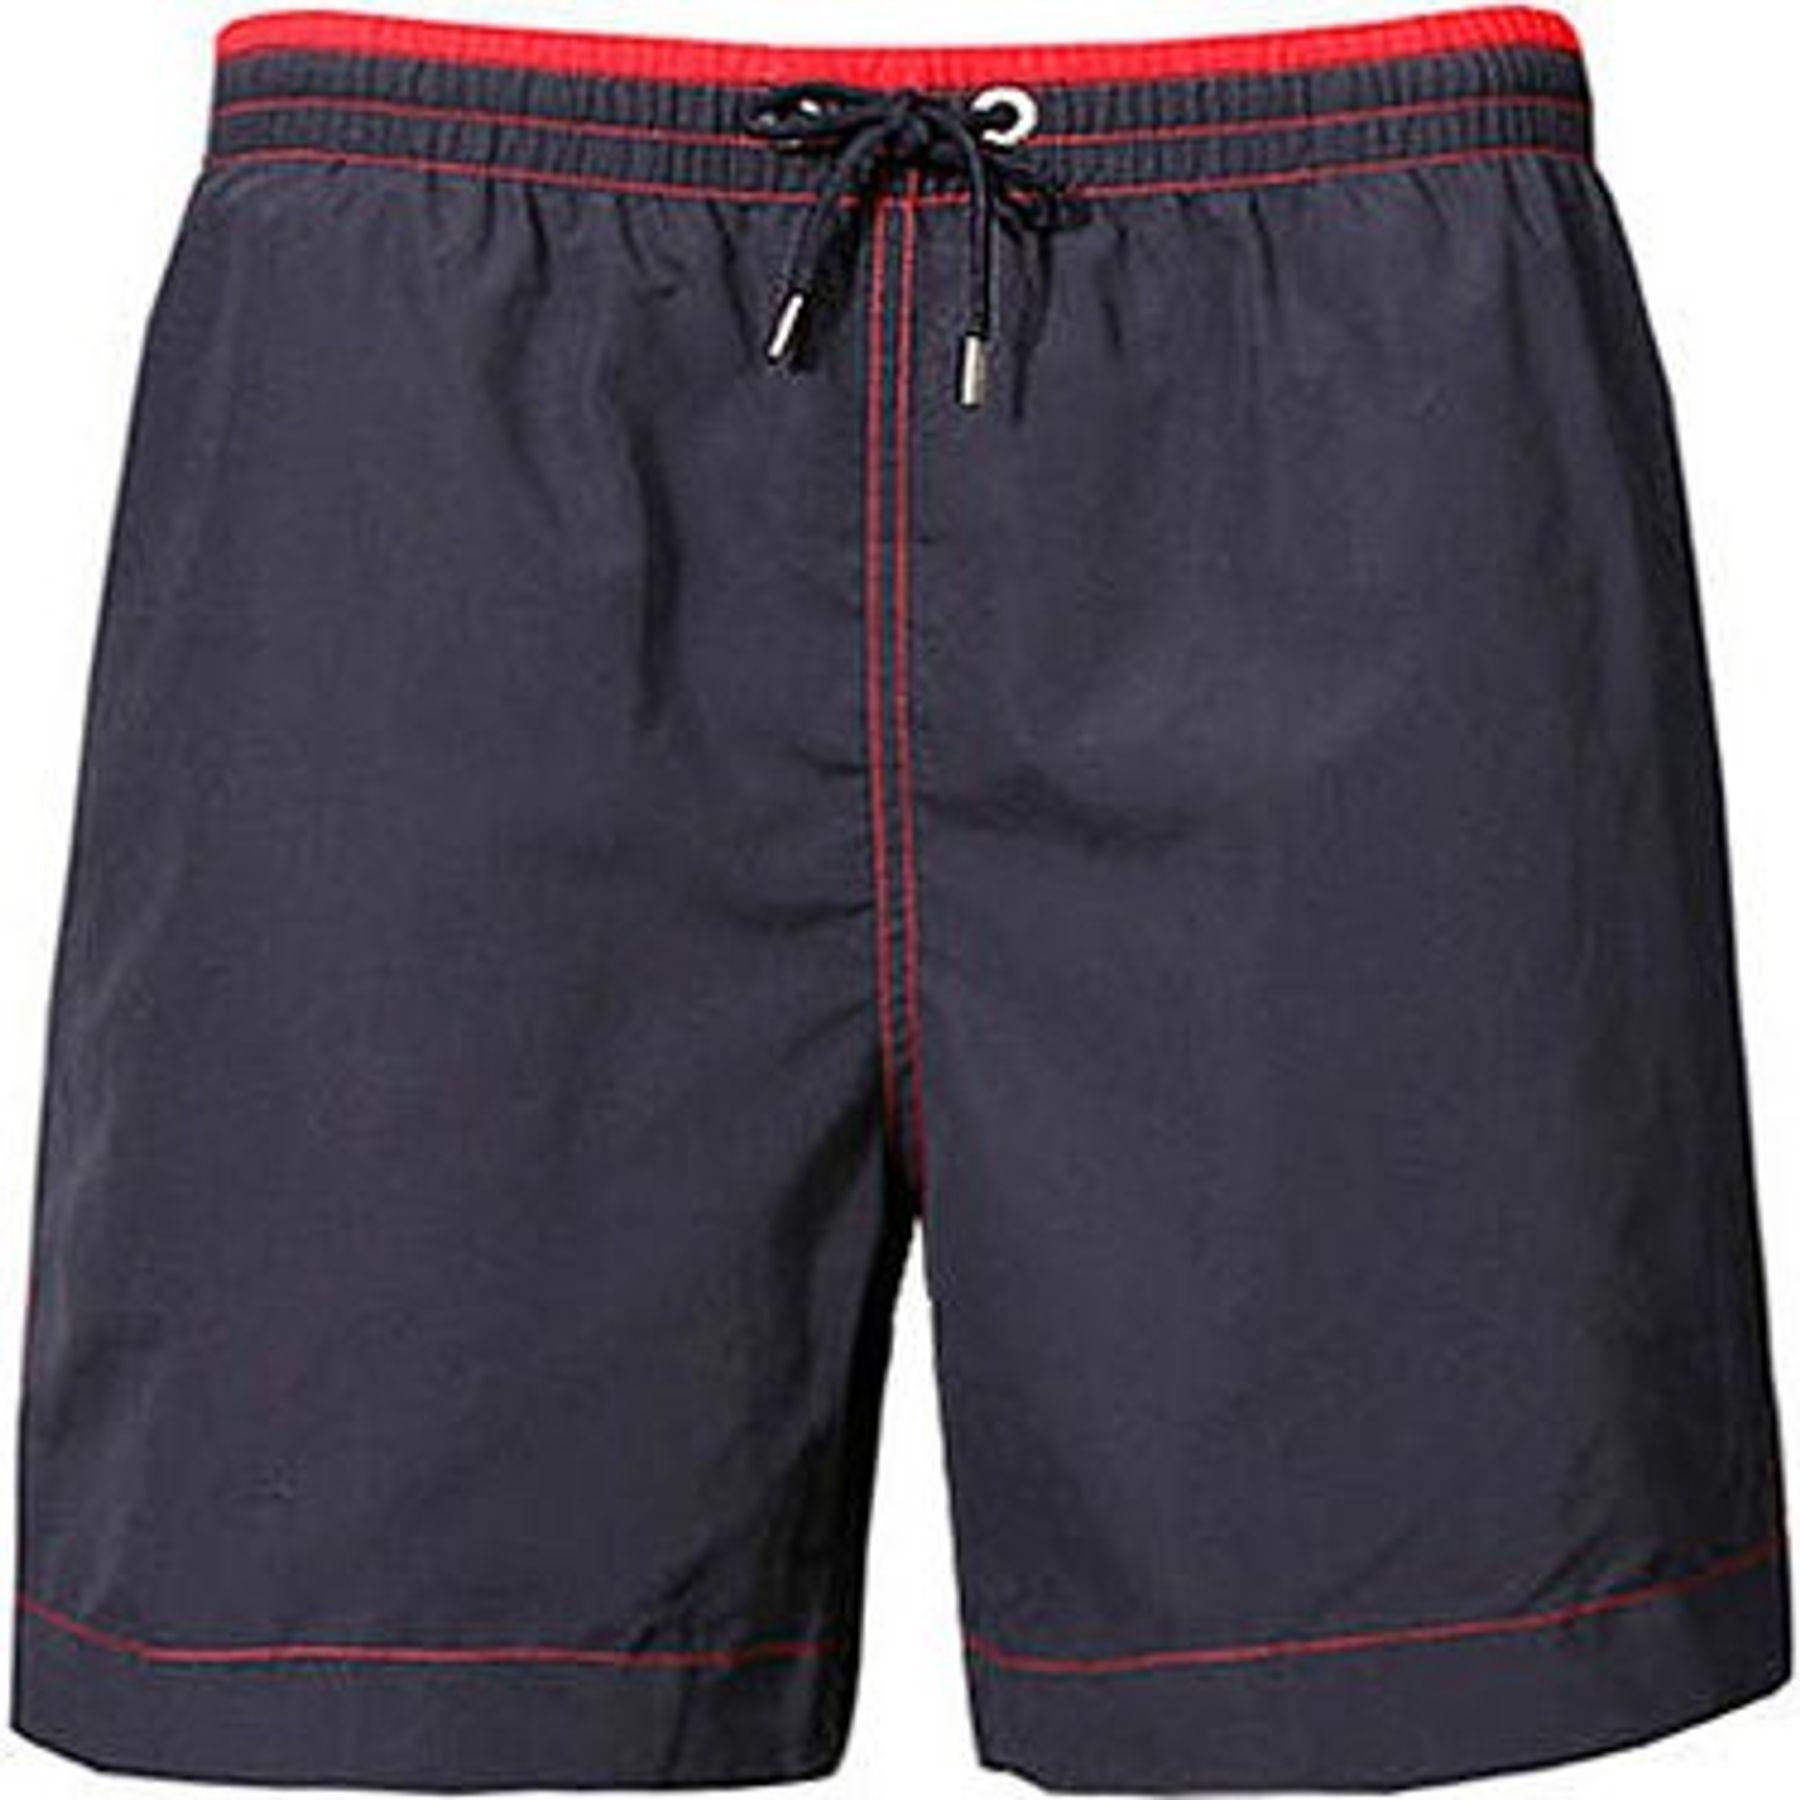 Jockey - Herren Long-Short USA Originals, Beachwear (60013) in 3 Farben – Bild 1